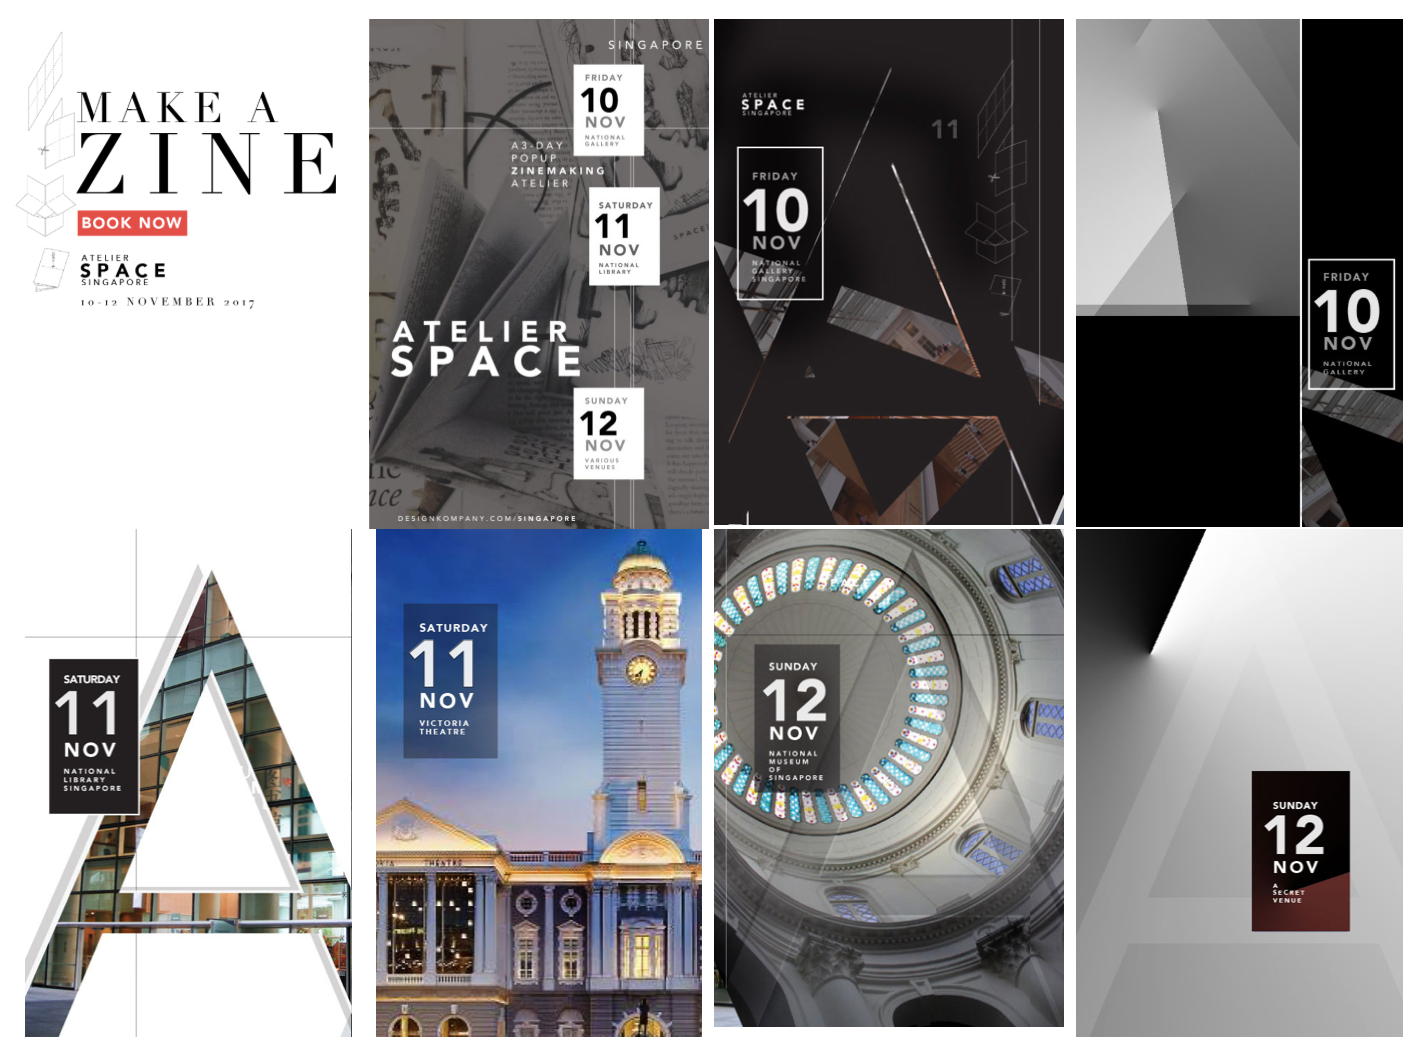 Atelier-Space-Singapore-Design-Kompany